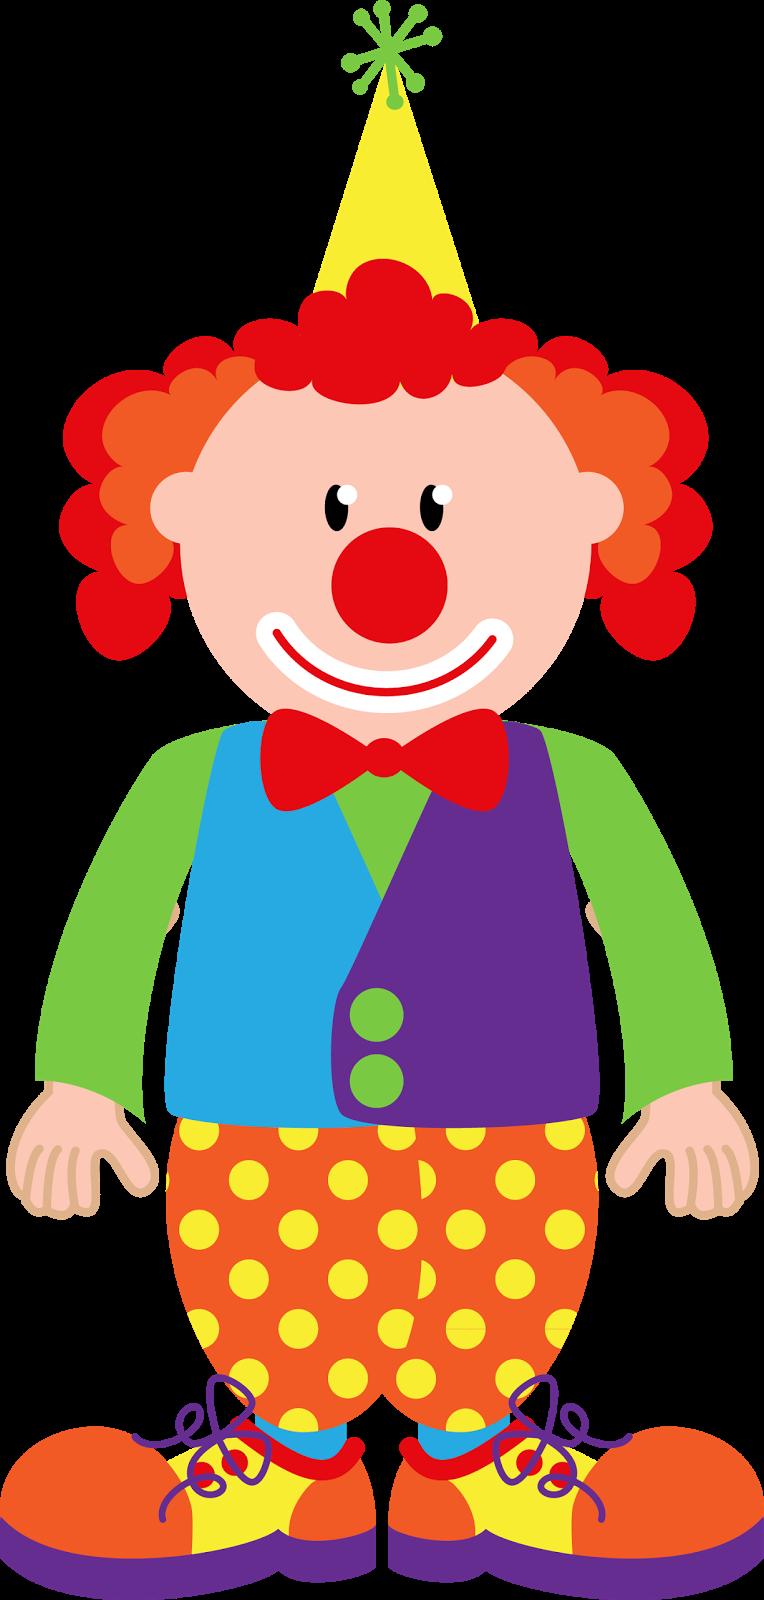 E a festa circo. Hands clipart clown